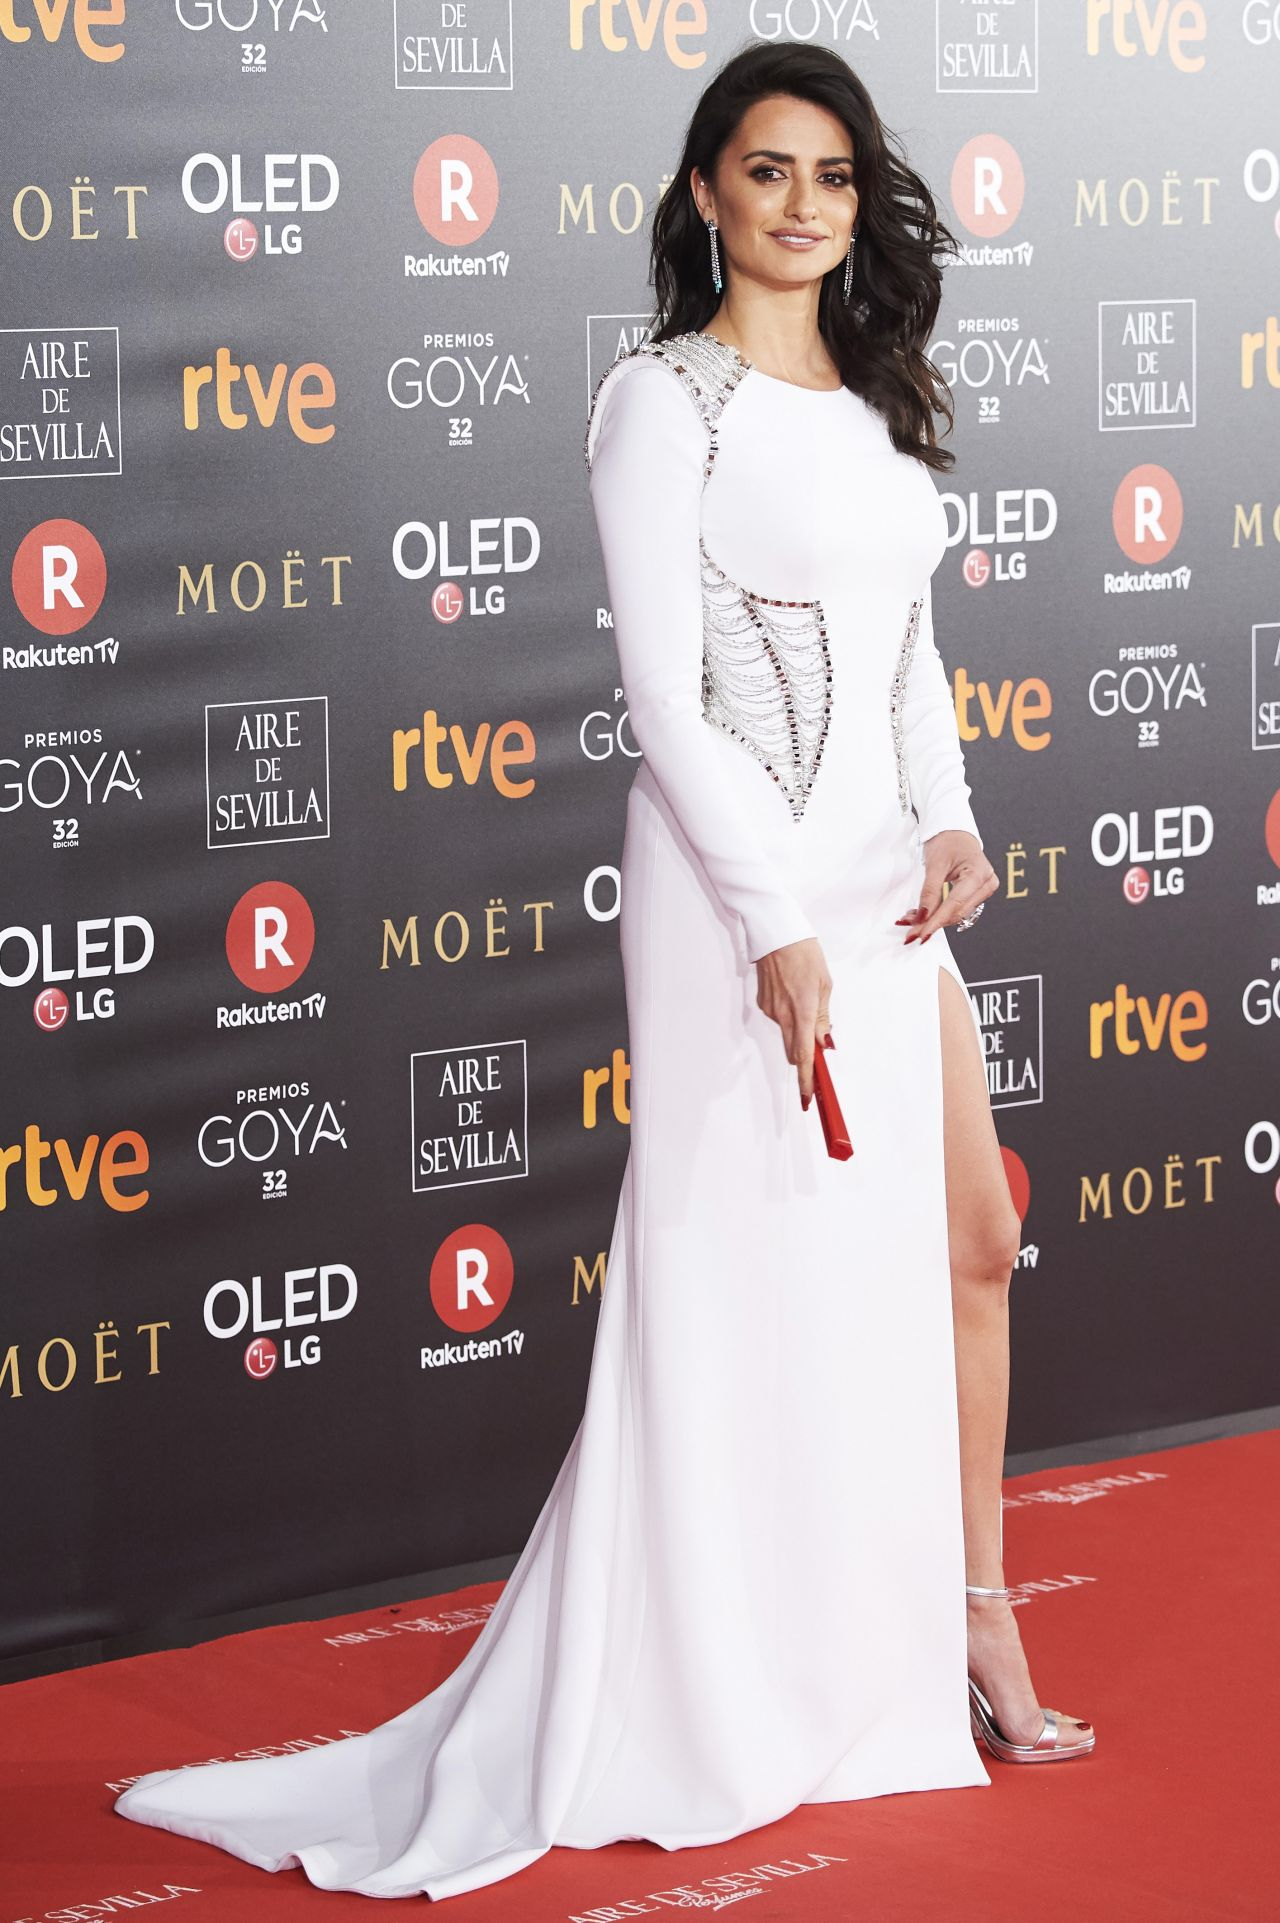 http://celebmafia.com/wp-content/uploads/2018/02/penelope-cruz-2018-goya-awards-in-madrid-12.jpg